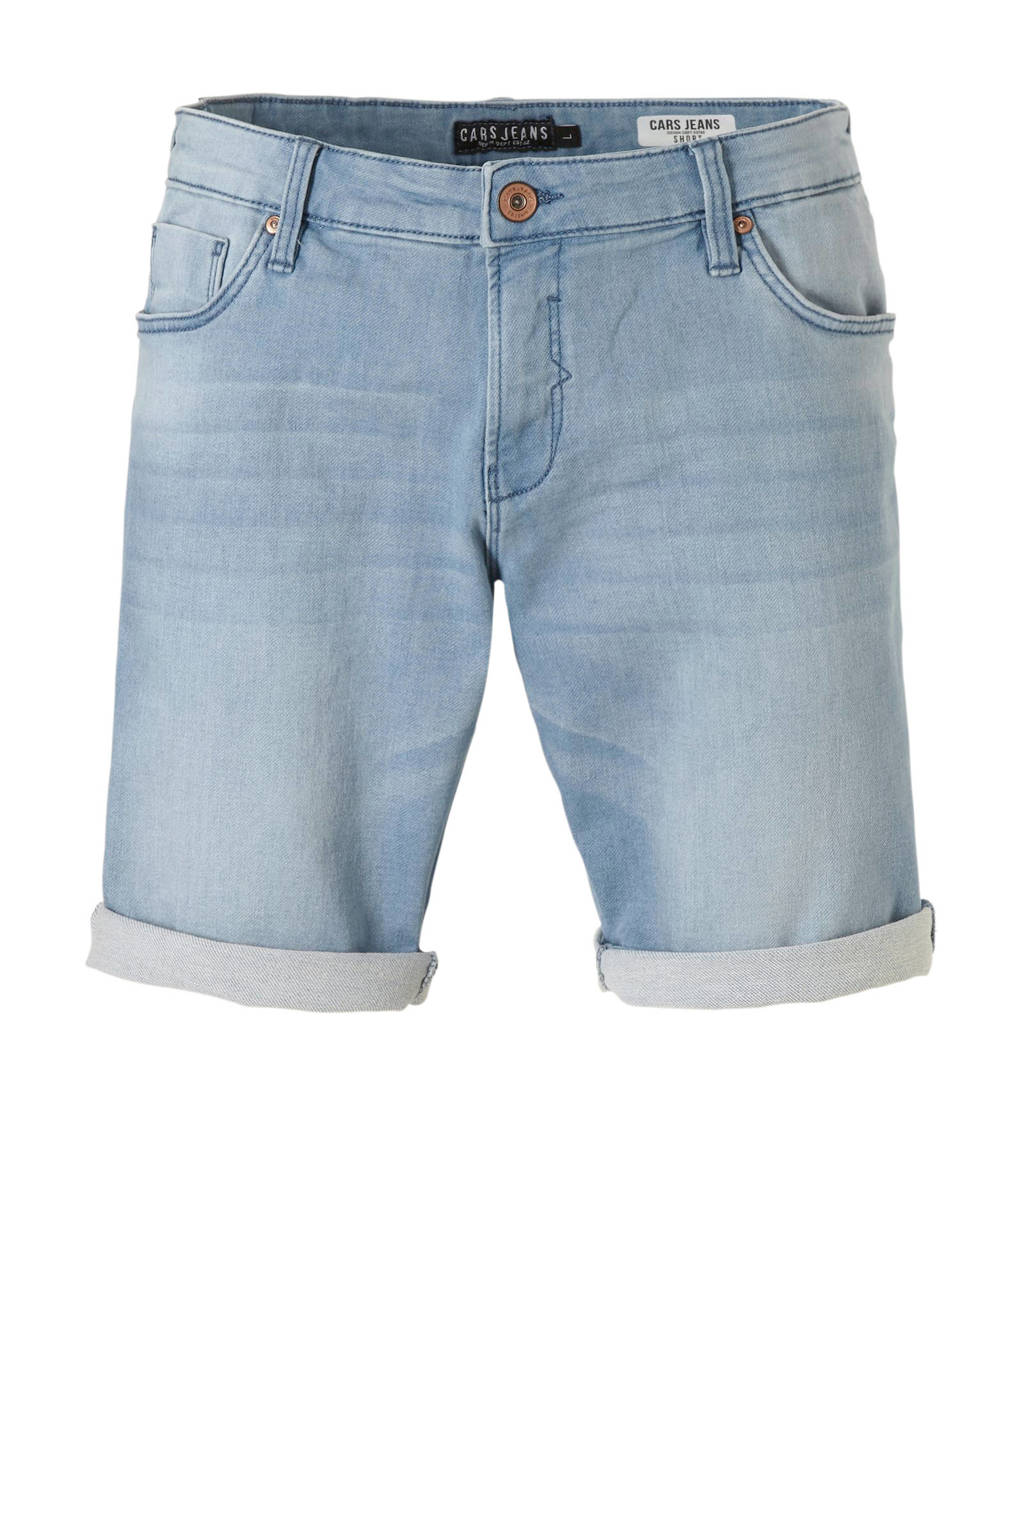 Cars jeans short, Blauw